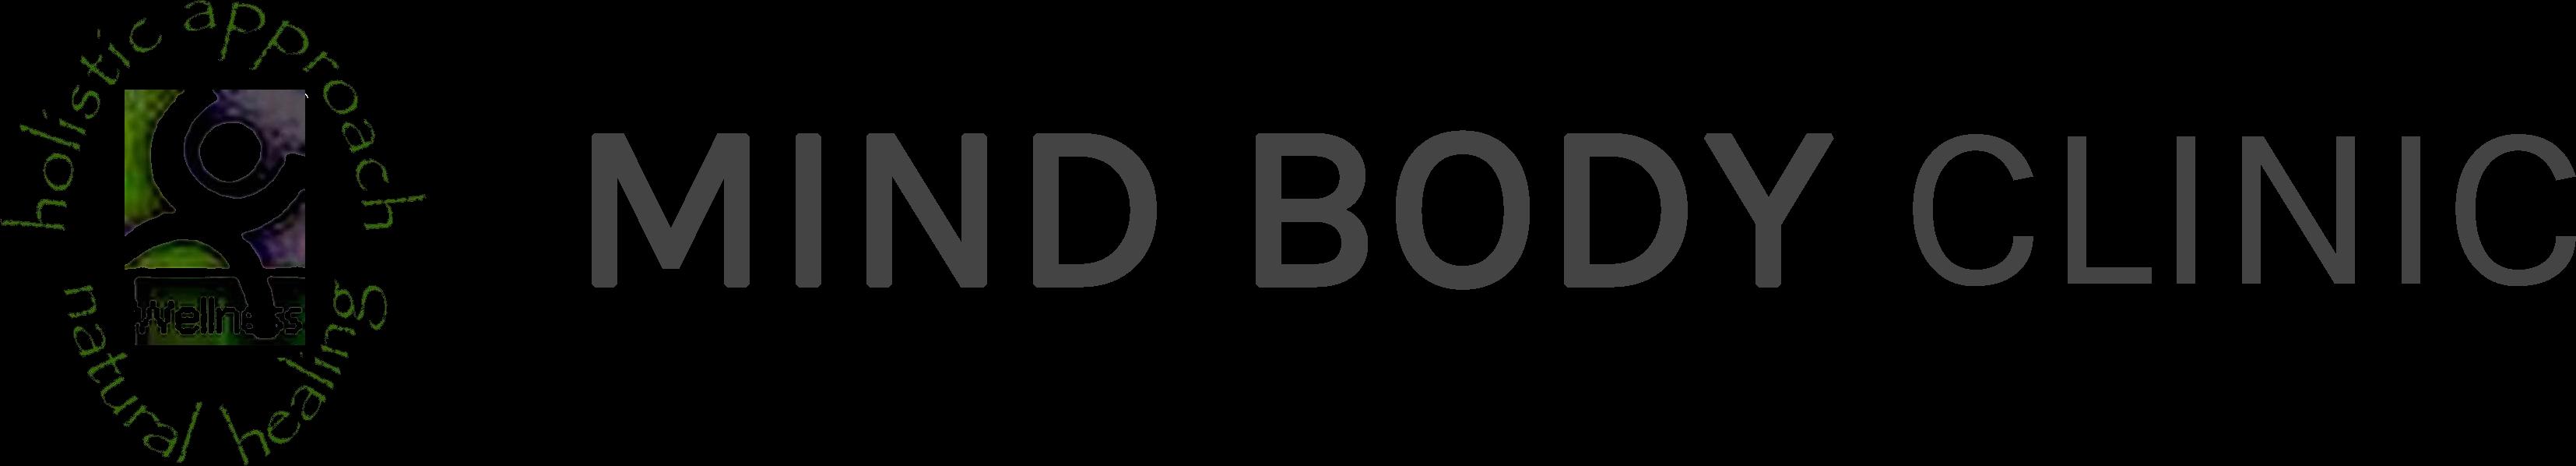 Mind Body Clinic